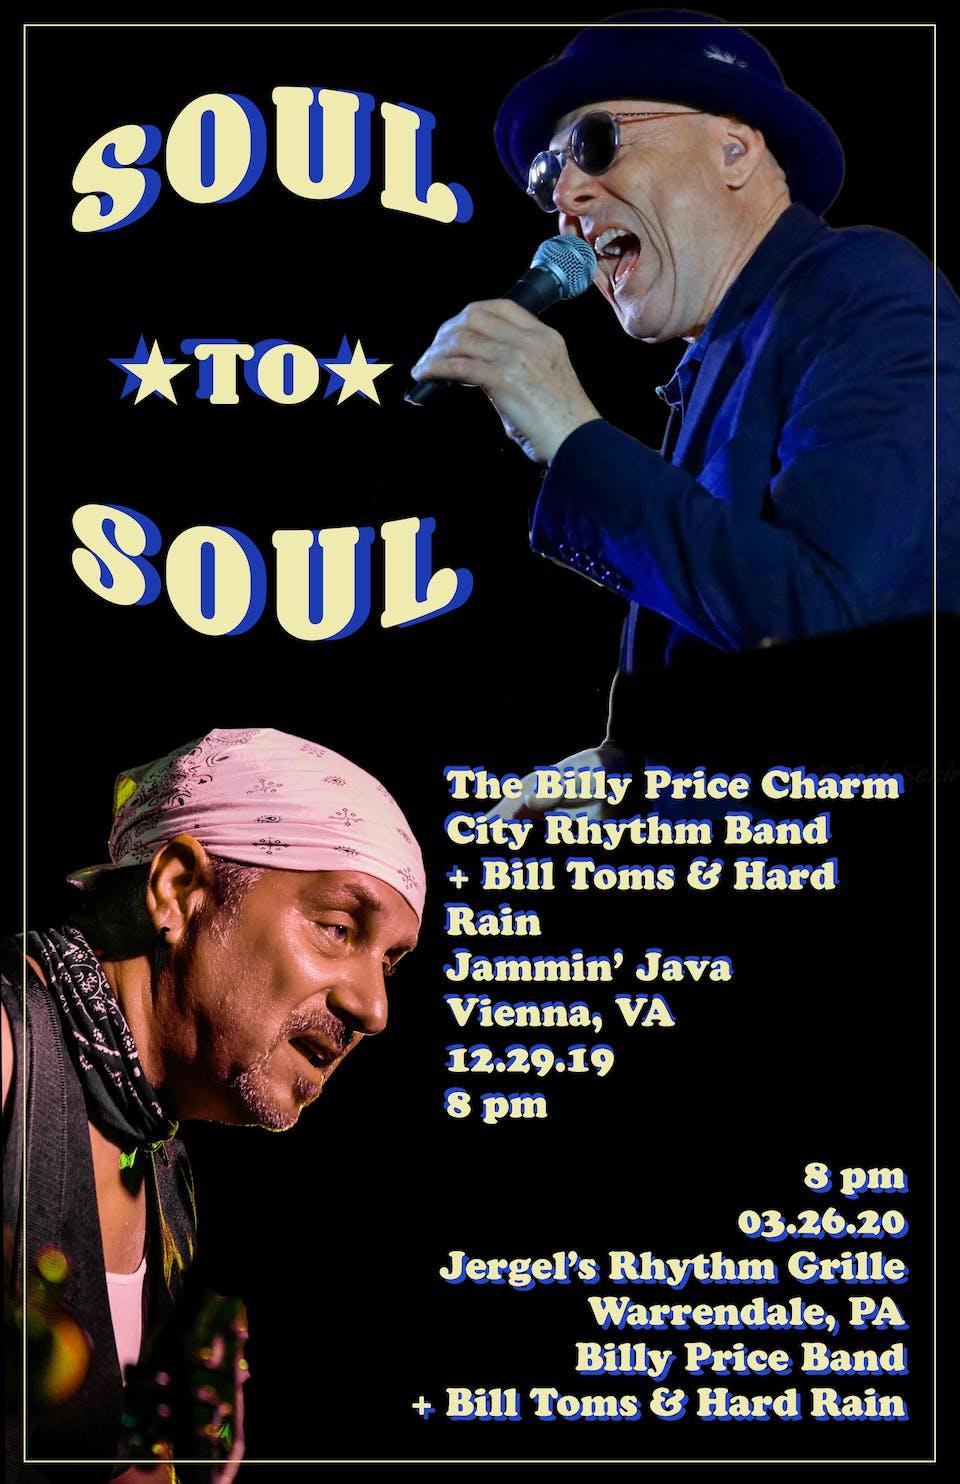 Billy Price Charm City Rhythm Band + Bill Toms and Hard Rain